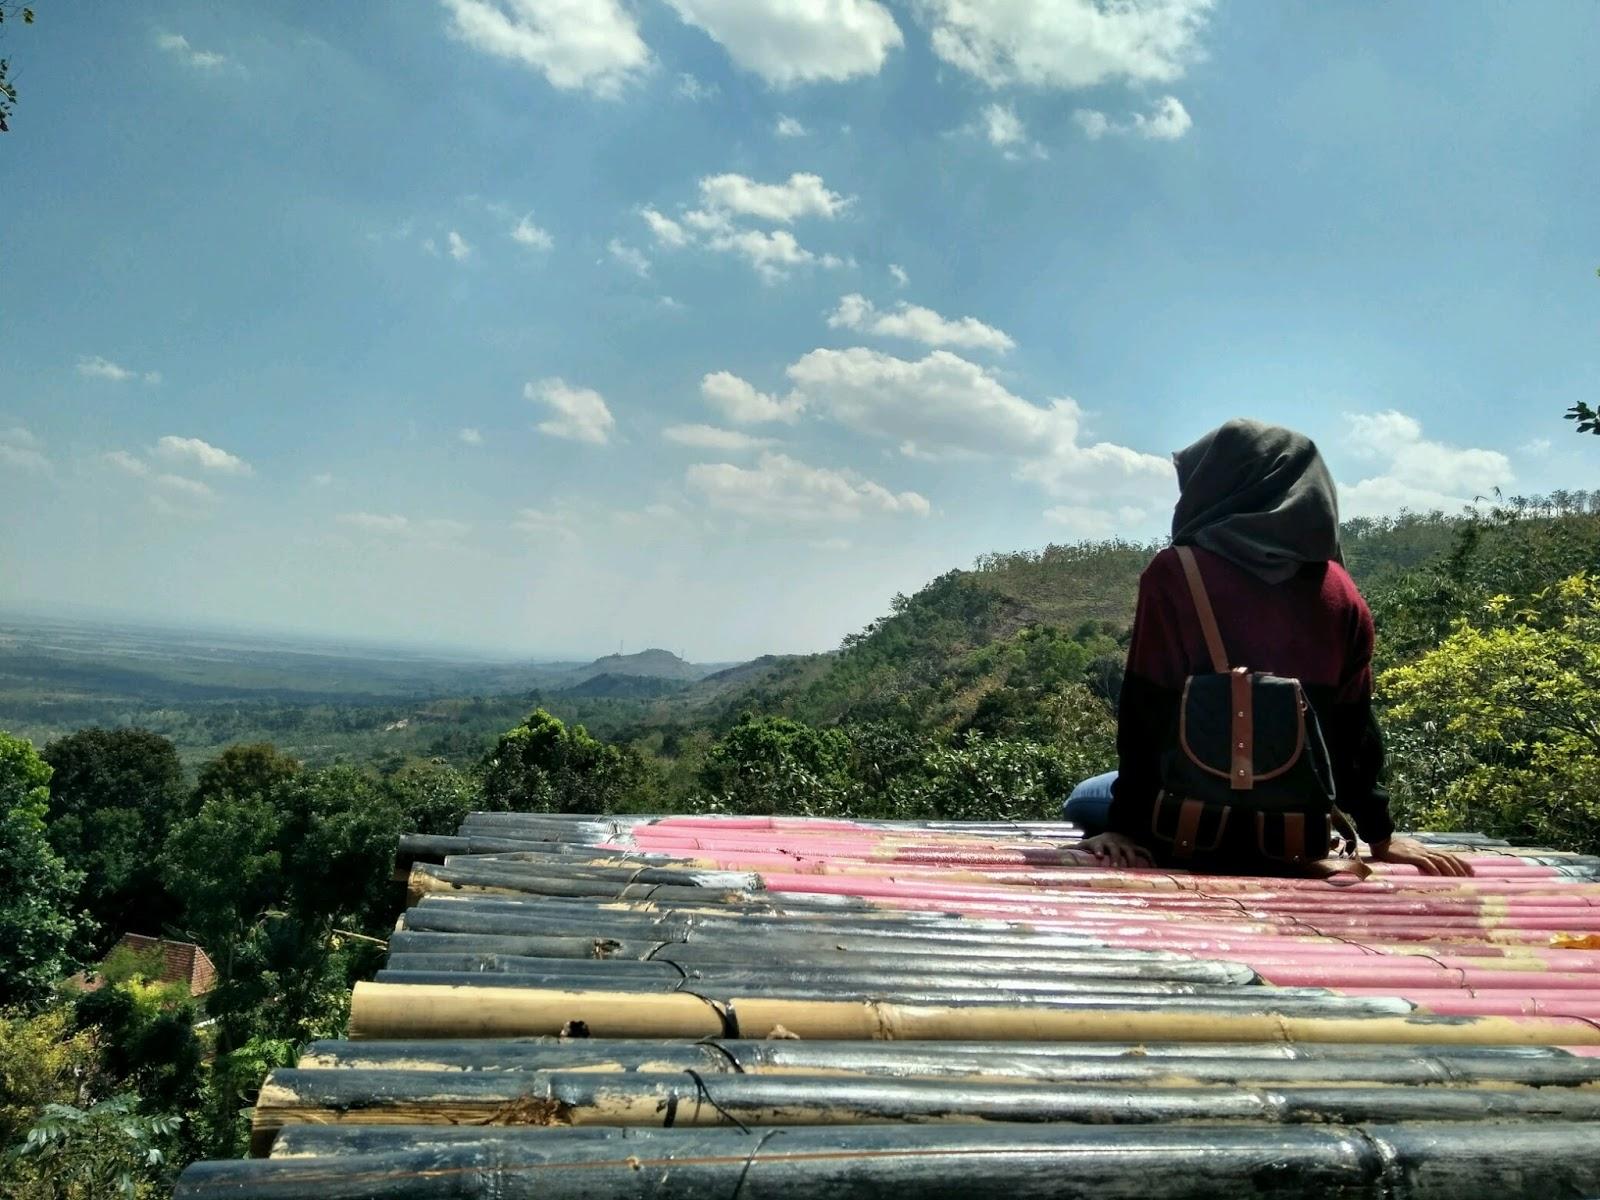 Jatipohon Tujuan Wisata Favorit Kabupaten Grobogan Berpesan Masyarakat Desa Bisa